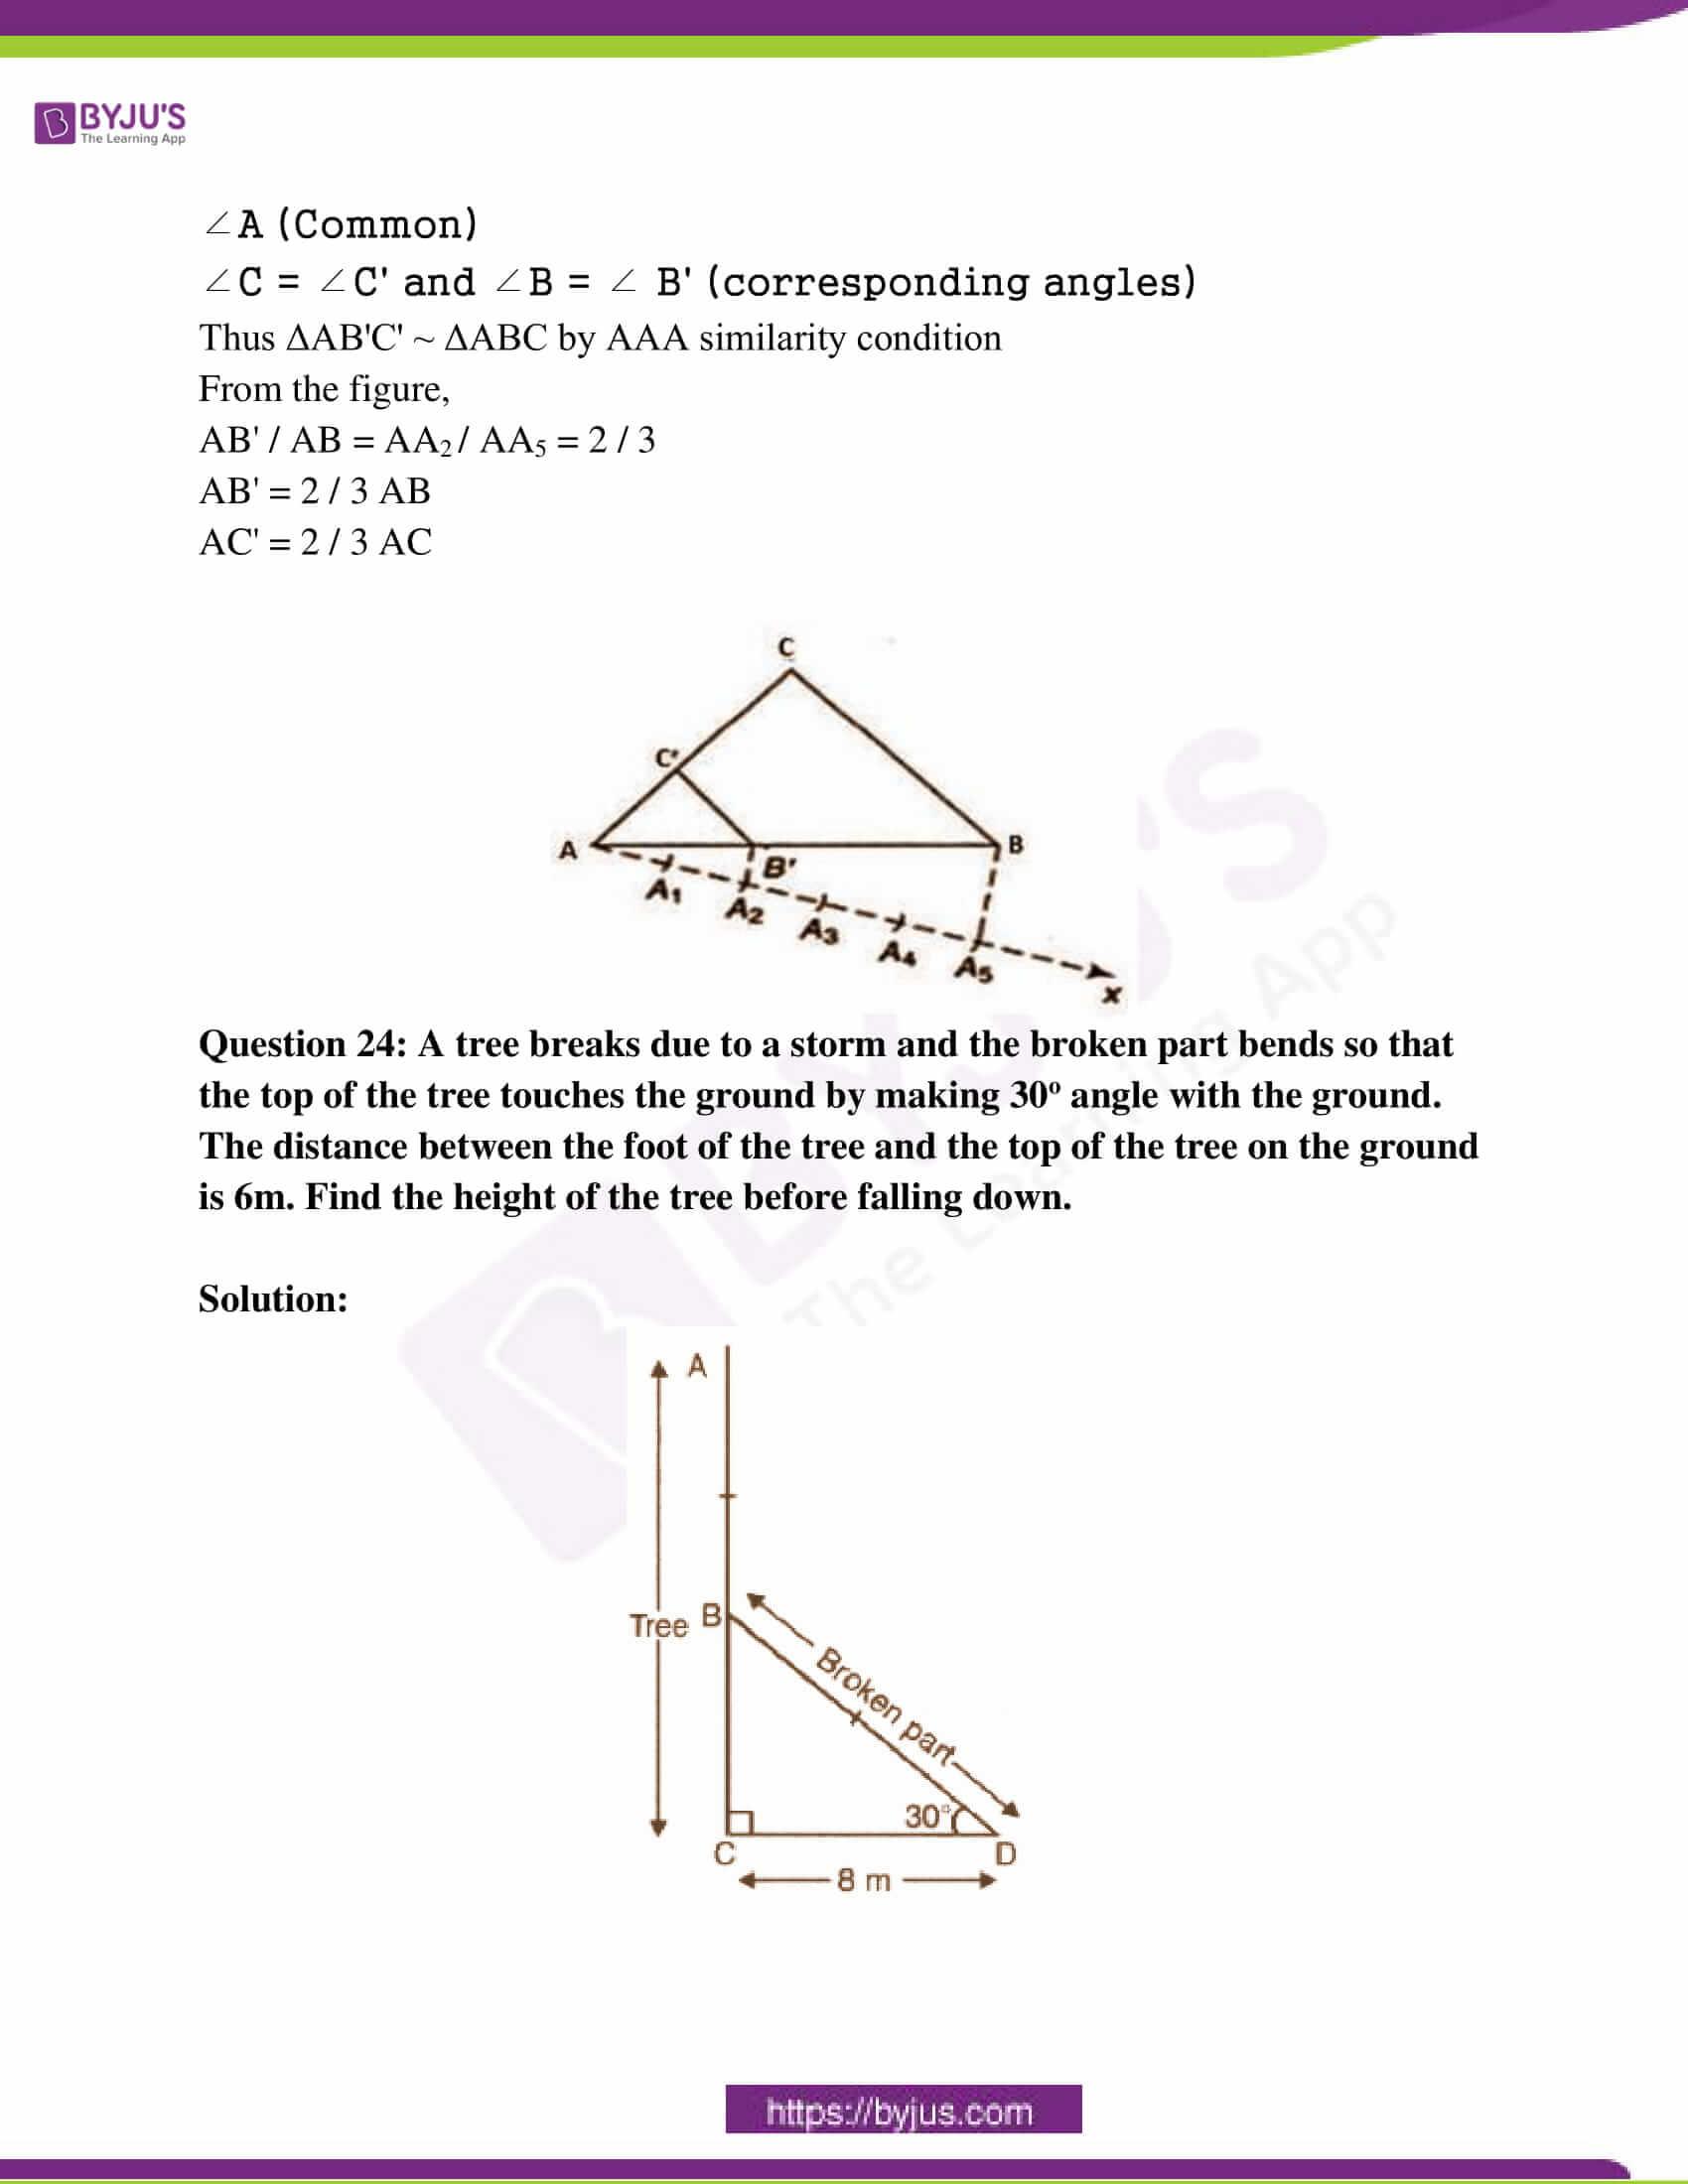 ap class 10 maths question paper 2 sol march 2016 14